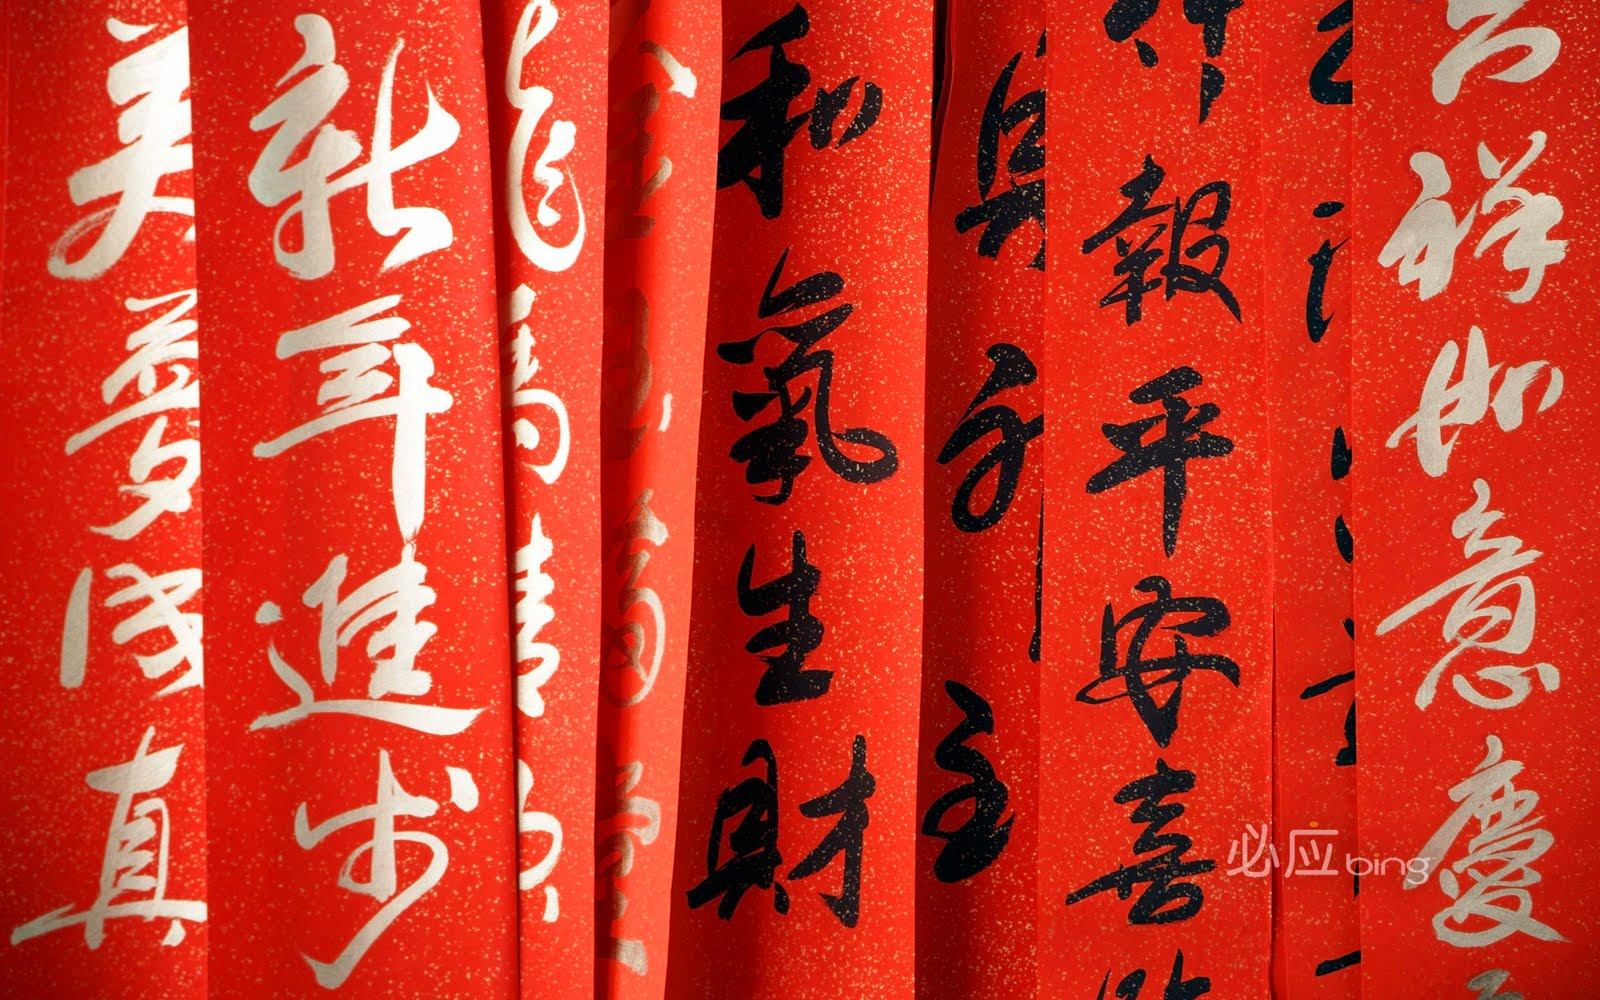 http://2.bp.blogspot.com/-VoW2J6uHdv8/TagVMP7sAxI/AAAAAAAACKw/Awi3-ocQL9o/s1600/amazing+wallpaper+%25282%2529.jpg